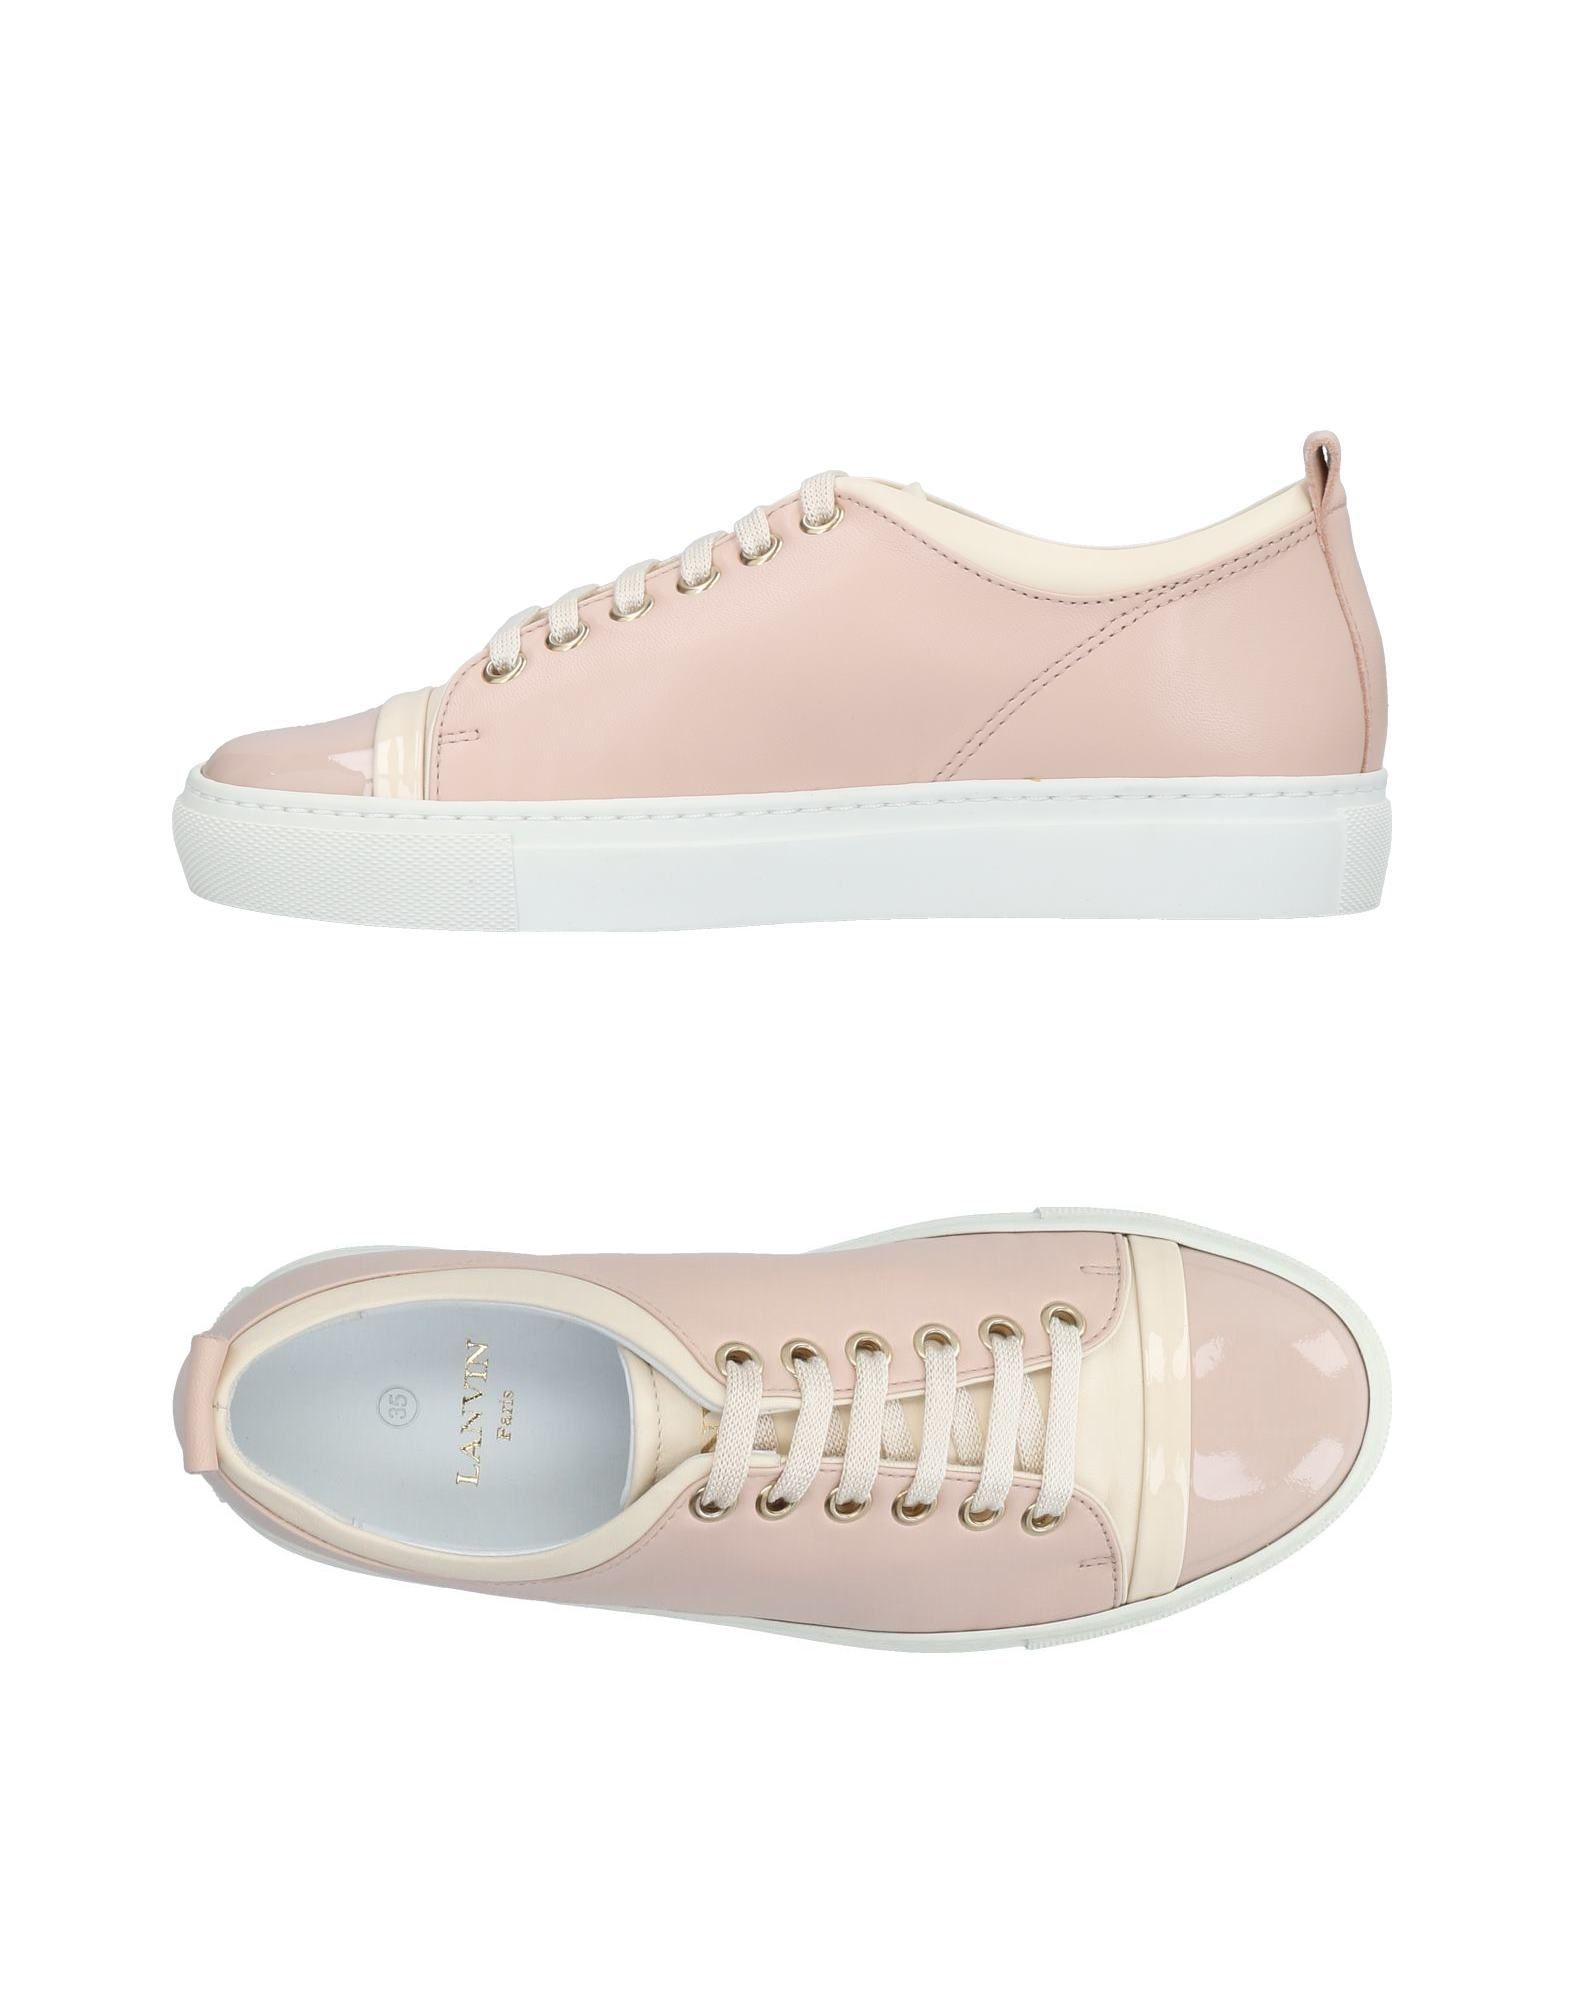 Moda Sneakers Lanvin Donna - 11491595GJ